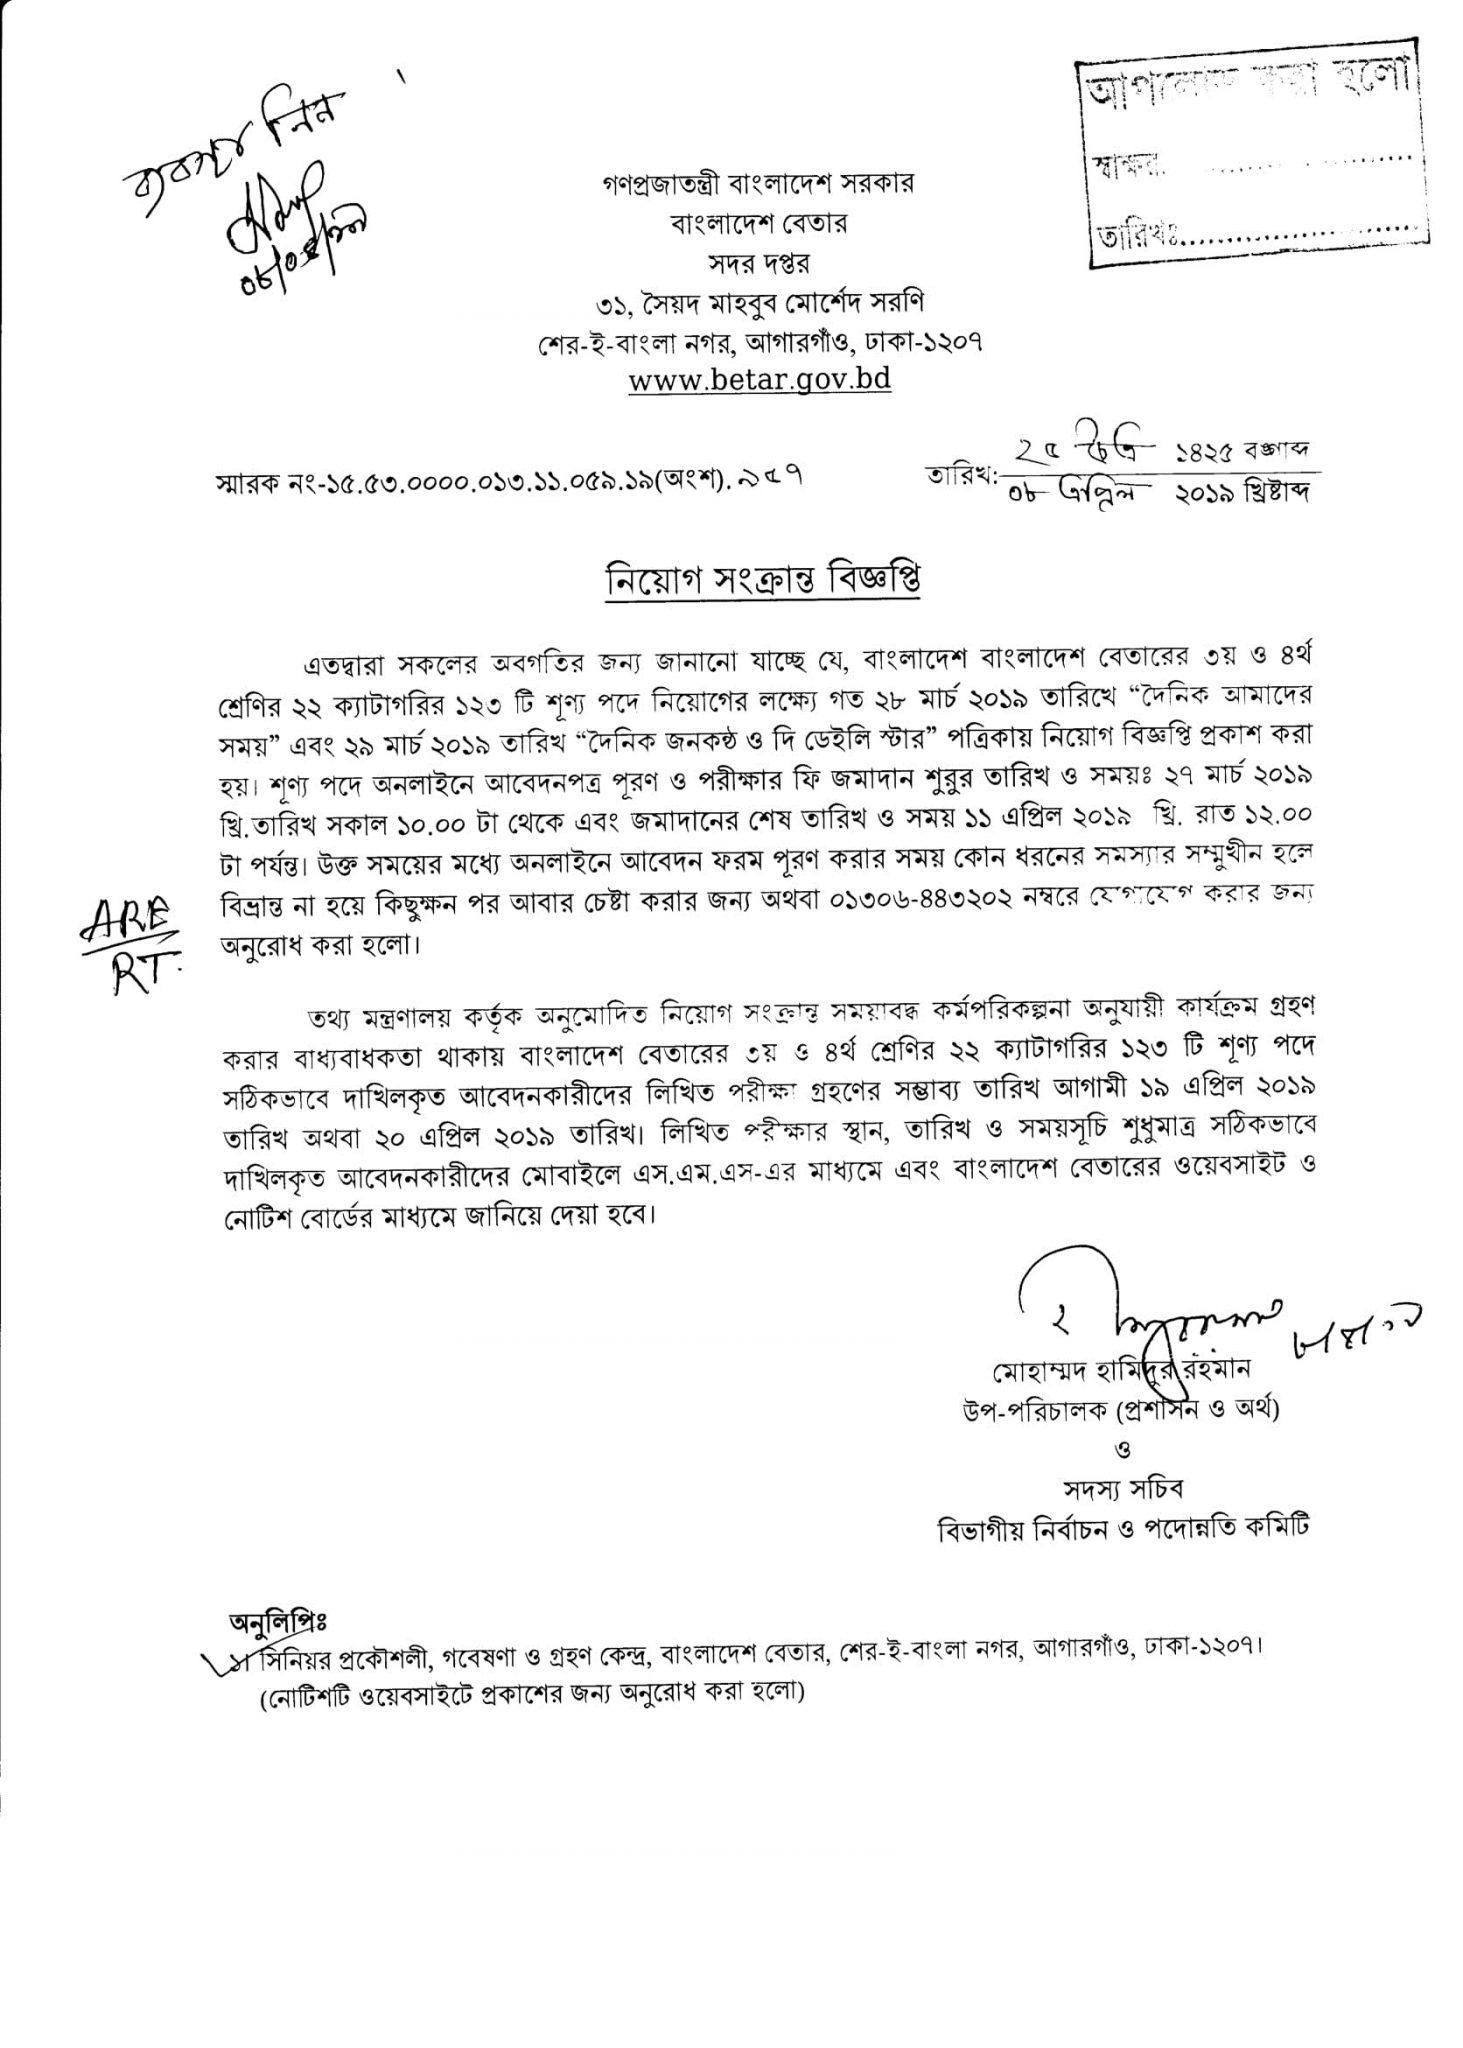 Bangladesh Betar Radio Job Circular 2019